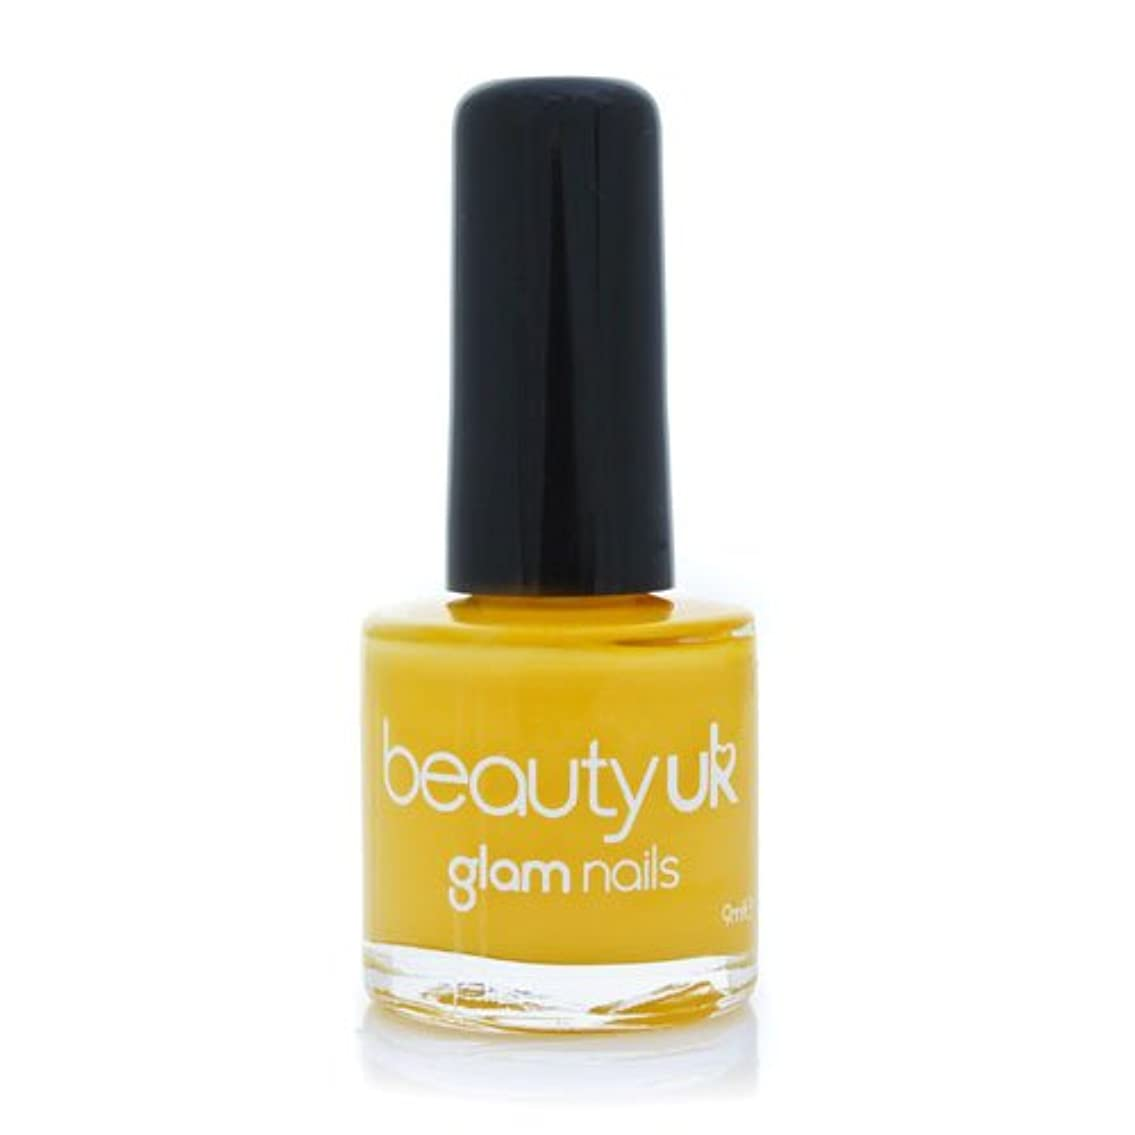 雷雨魔術師不運Beauty Uk Glam Nails No36 Yellow Peril 9ml [並行輸入品]